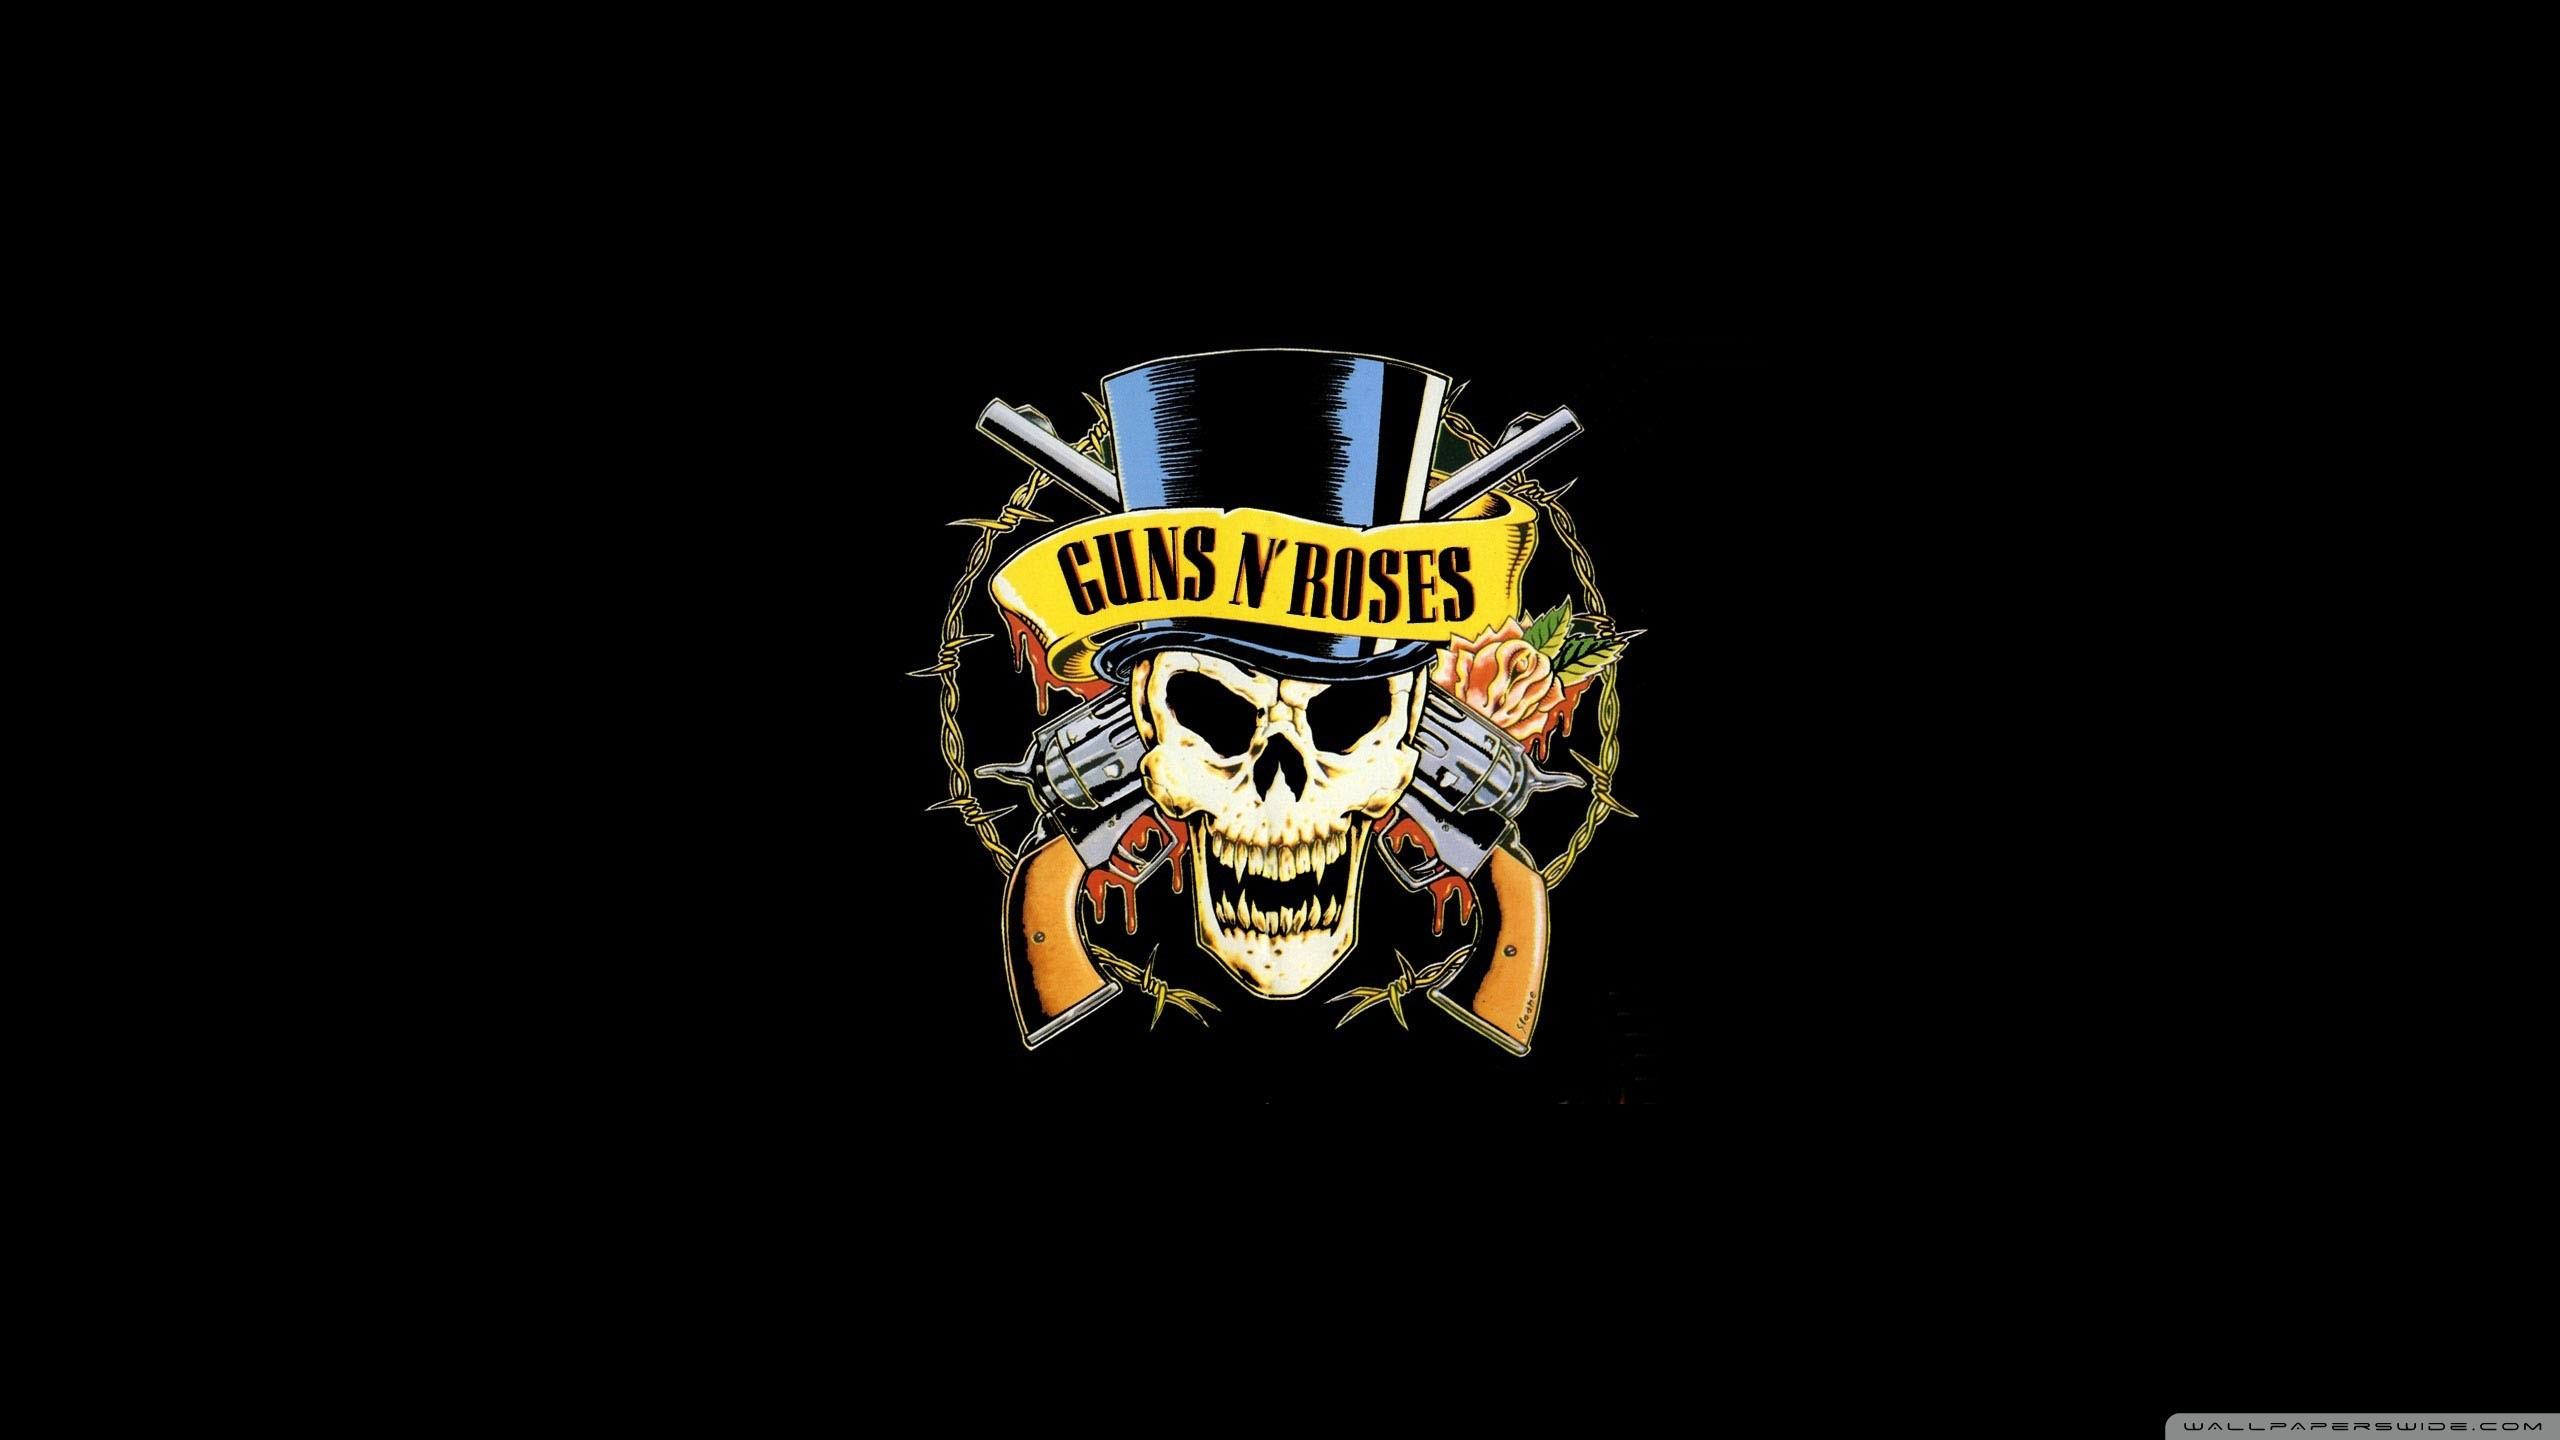 Guns N Roses Wallpapers Music Hq Guns N Roses Pictures: Guns N Roses Logo Wallpaper ·①